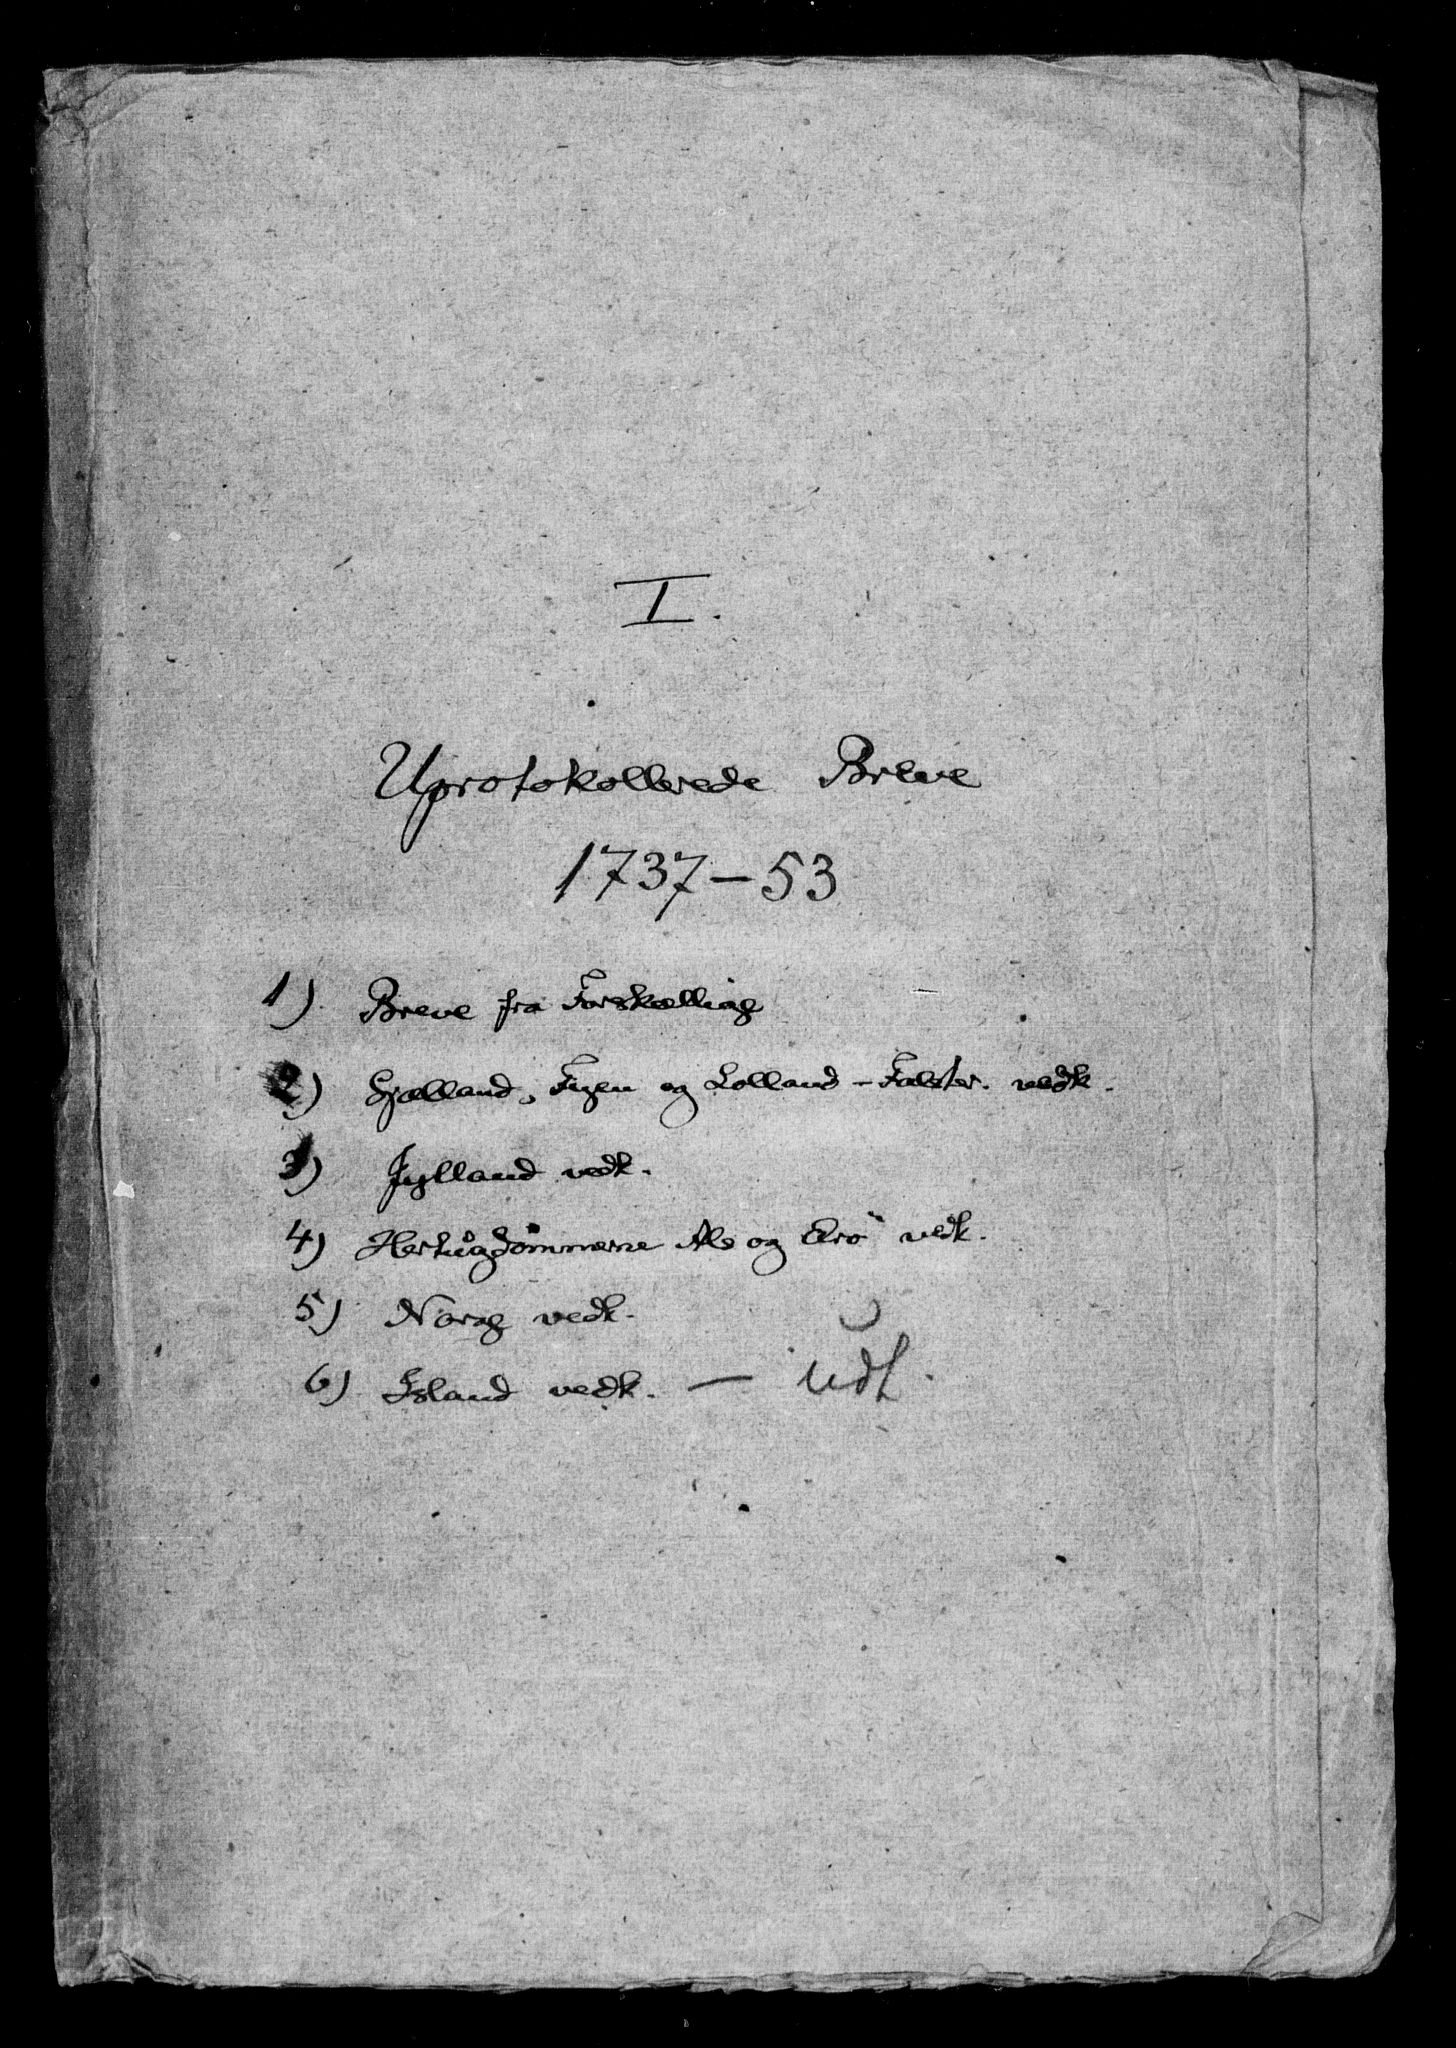 DRA, Generalkirkeinspektionskollegiet, F4-07/F4-07: Uprotokollerede breve og diverse dokumenter, 1737-1753